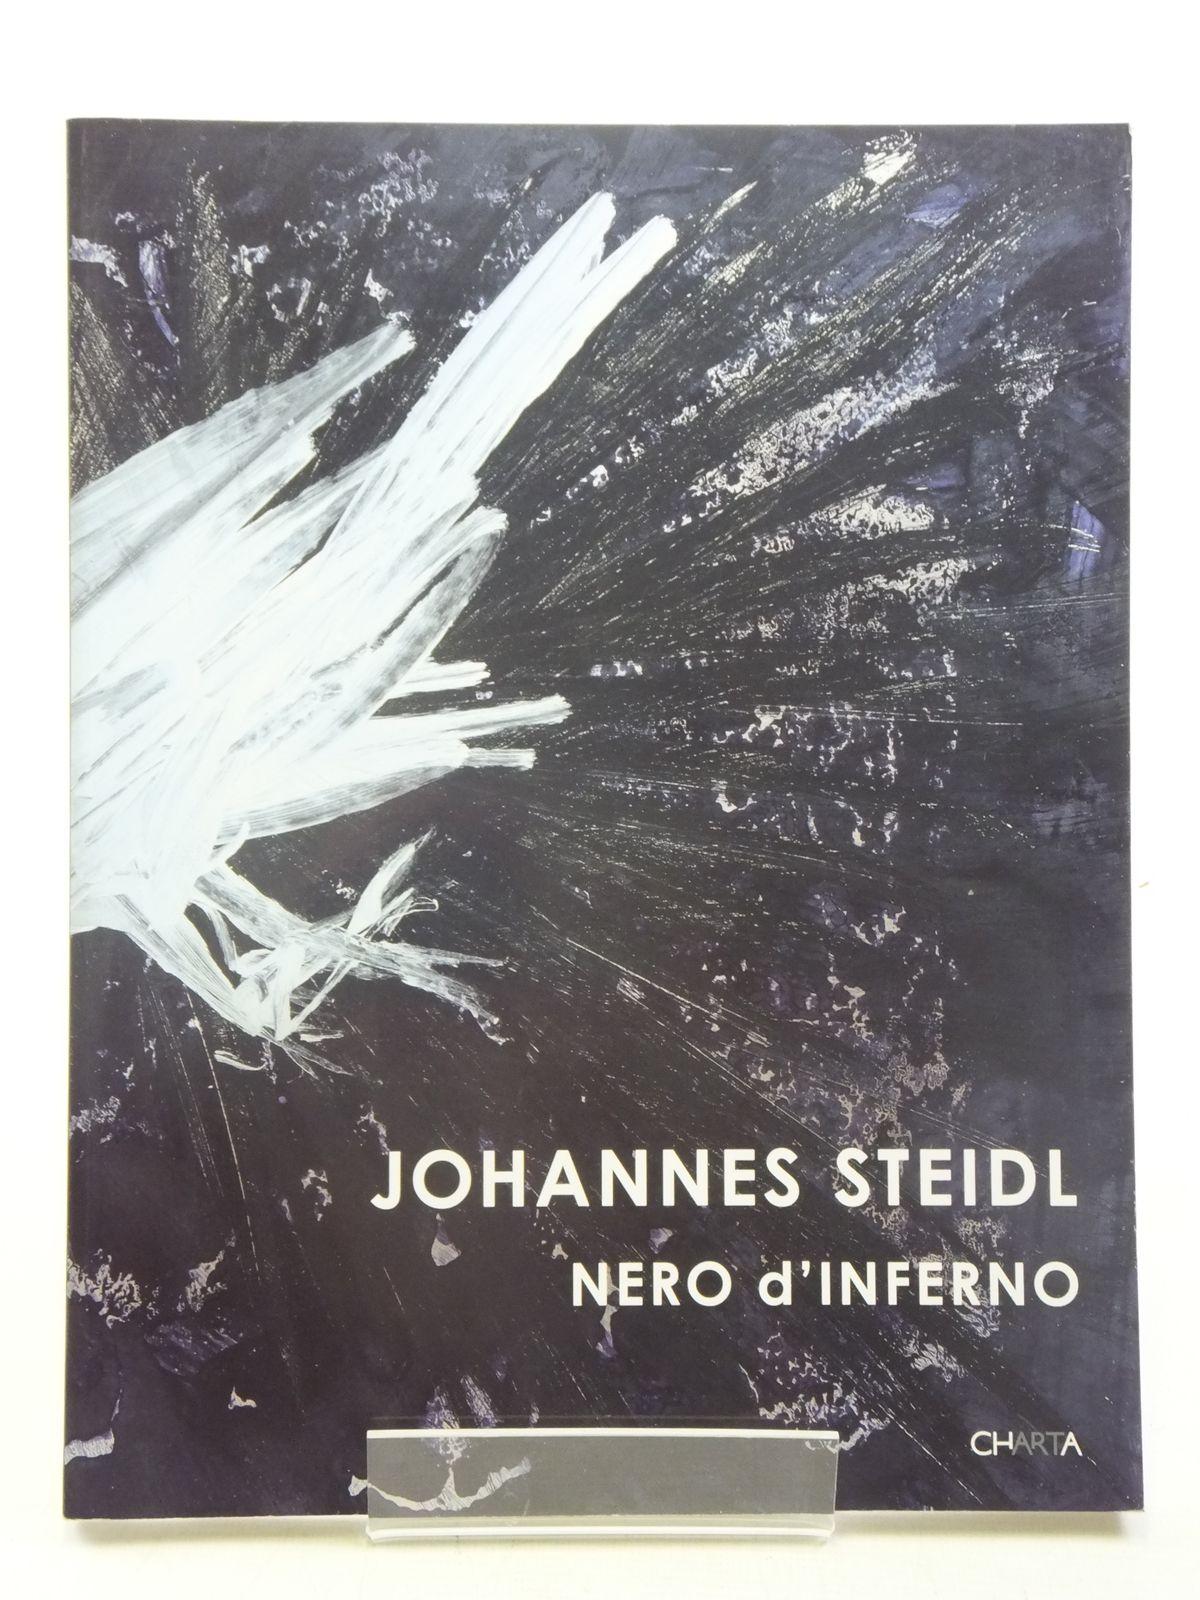 Photo of JOHANNES STEIDL NERO D'INFERNO